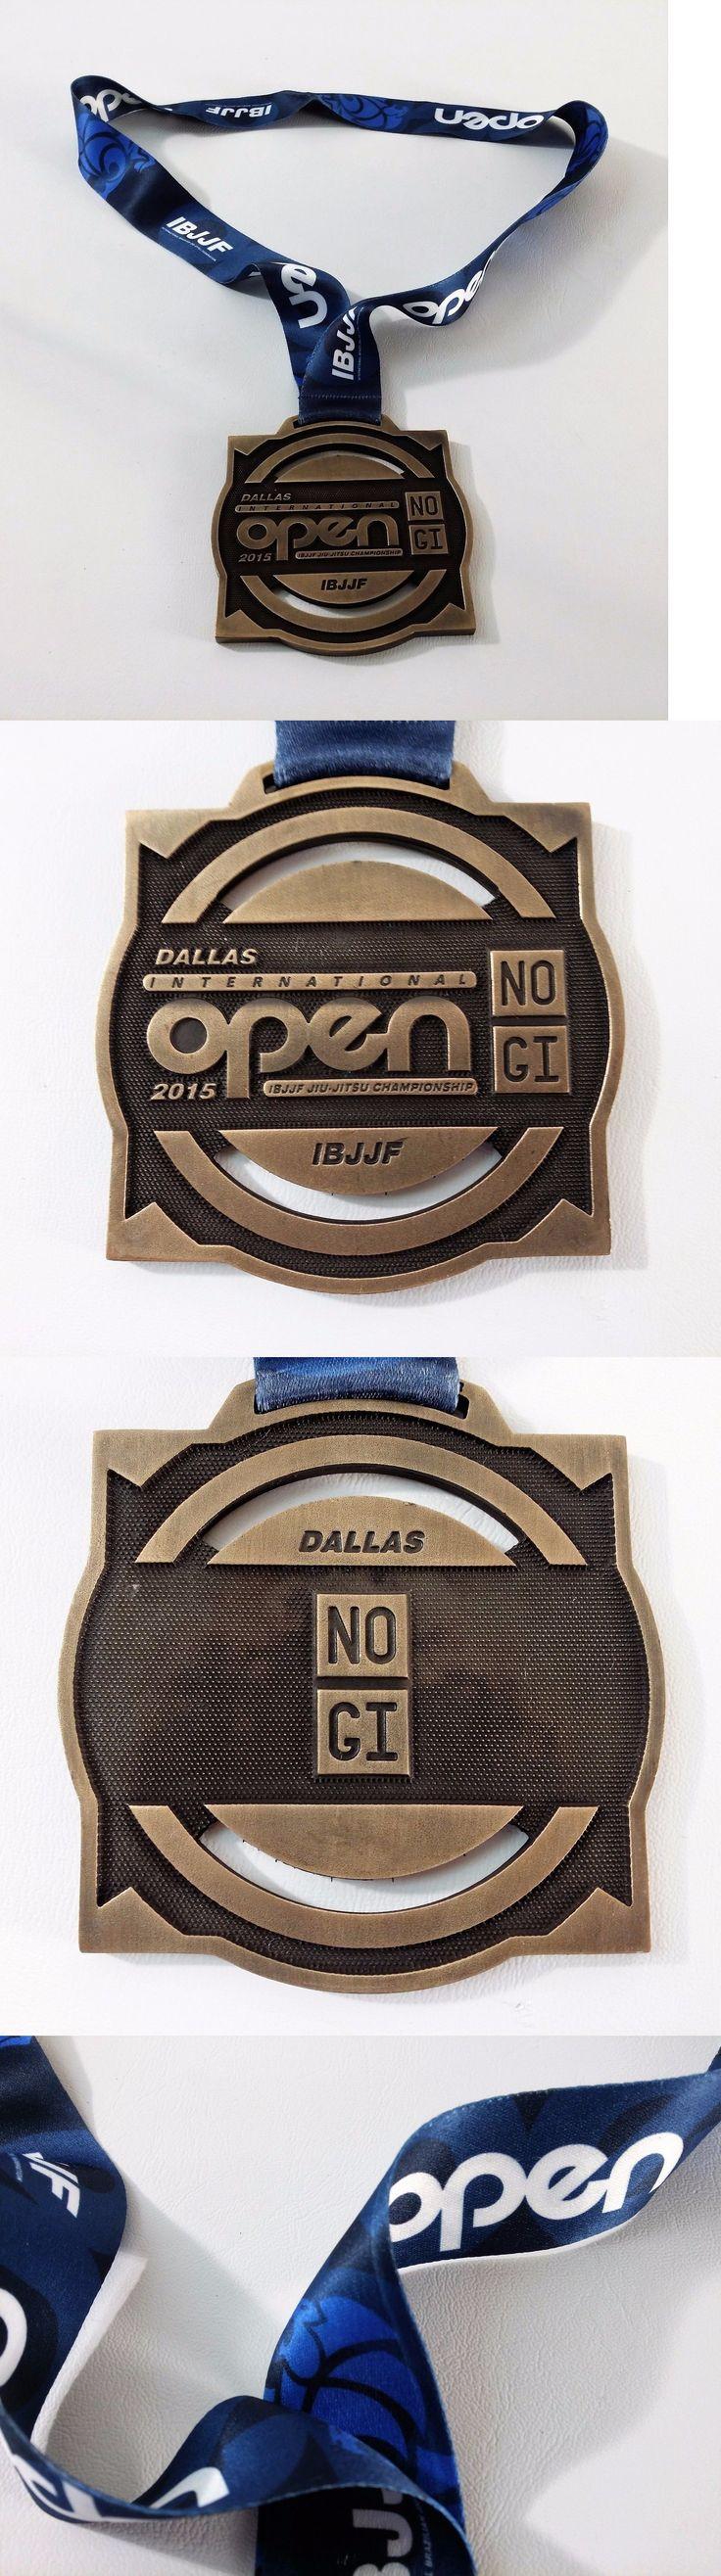 Other Combat Sport Supplies 16044: 2015 Dallas Tx Open Ibjjf Jiu Jitsu Championship Bronze Medal Trophy No Gi Award -> BUY IT NOW ONLY: $39.95 on eBay!